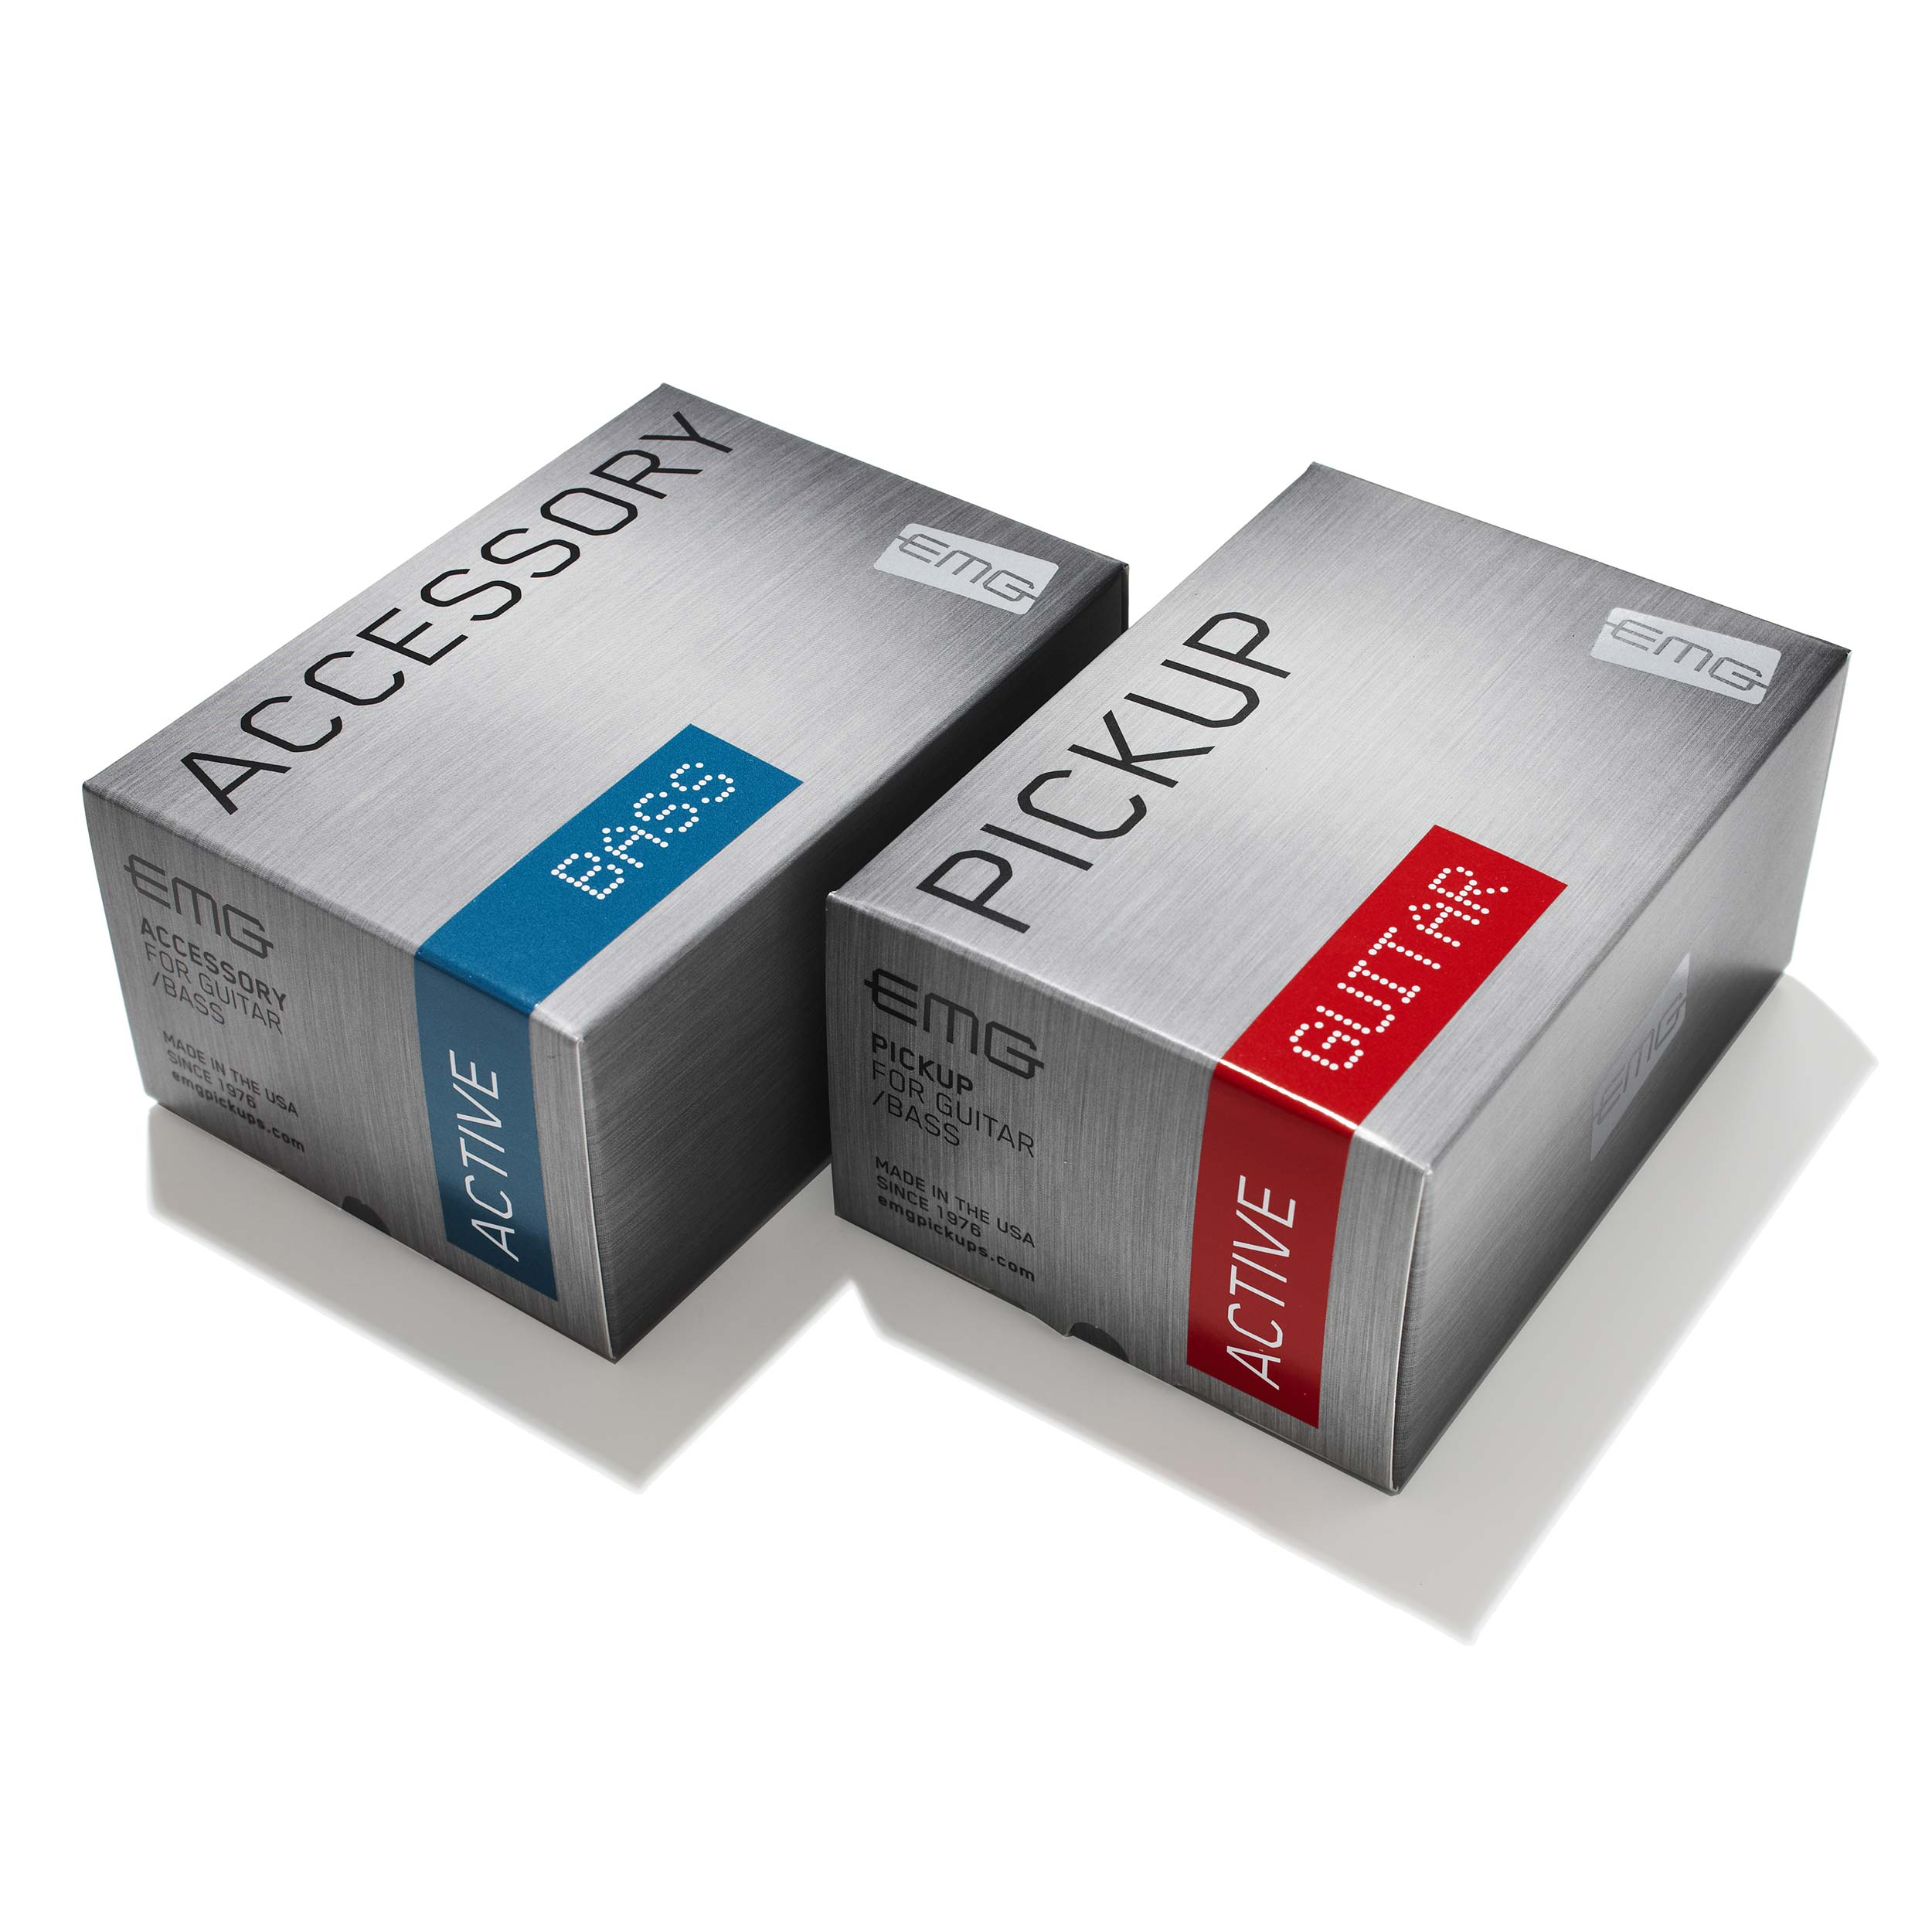 EMG-Packaging-Small-Box.jpg